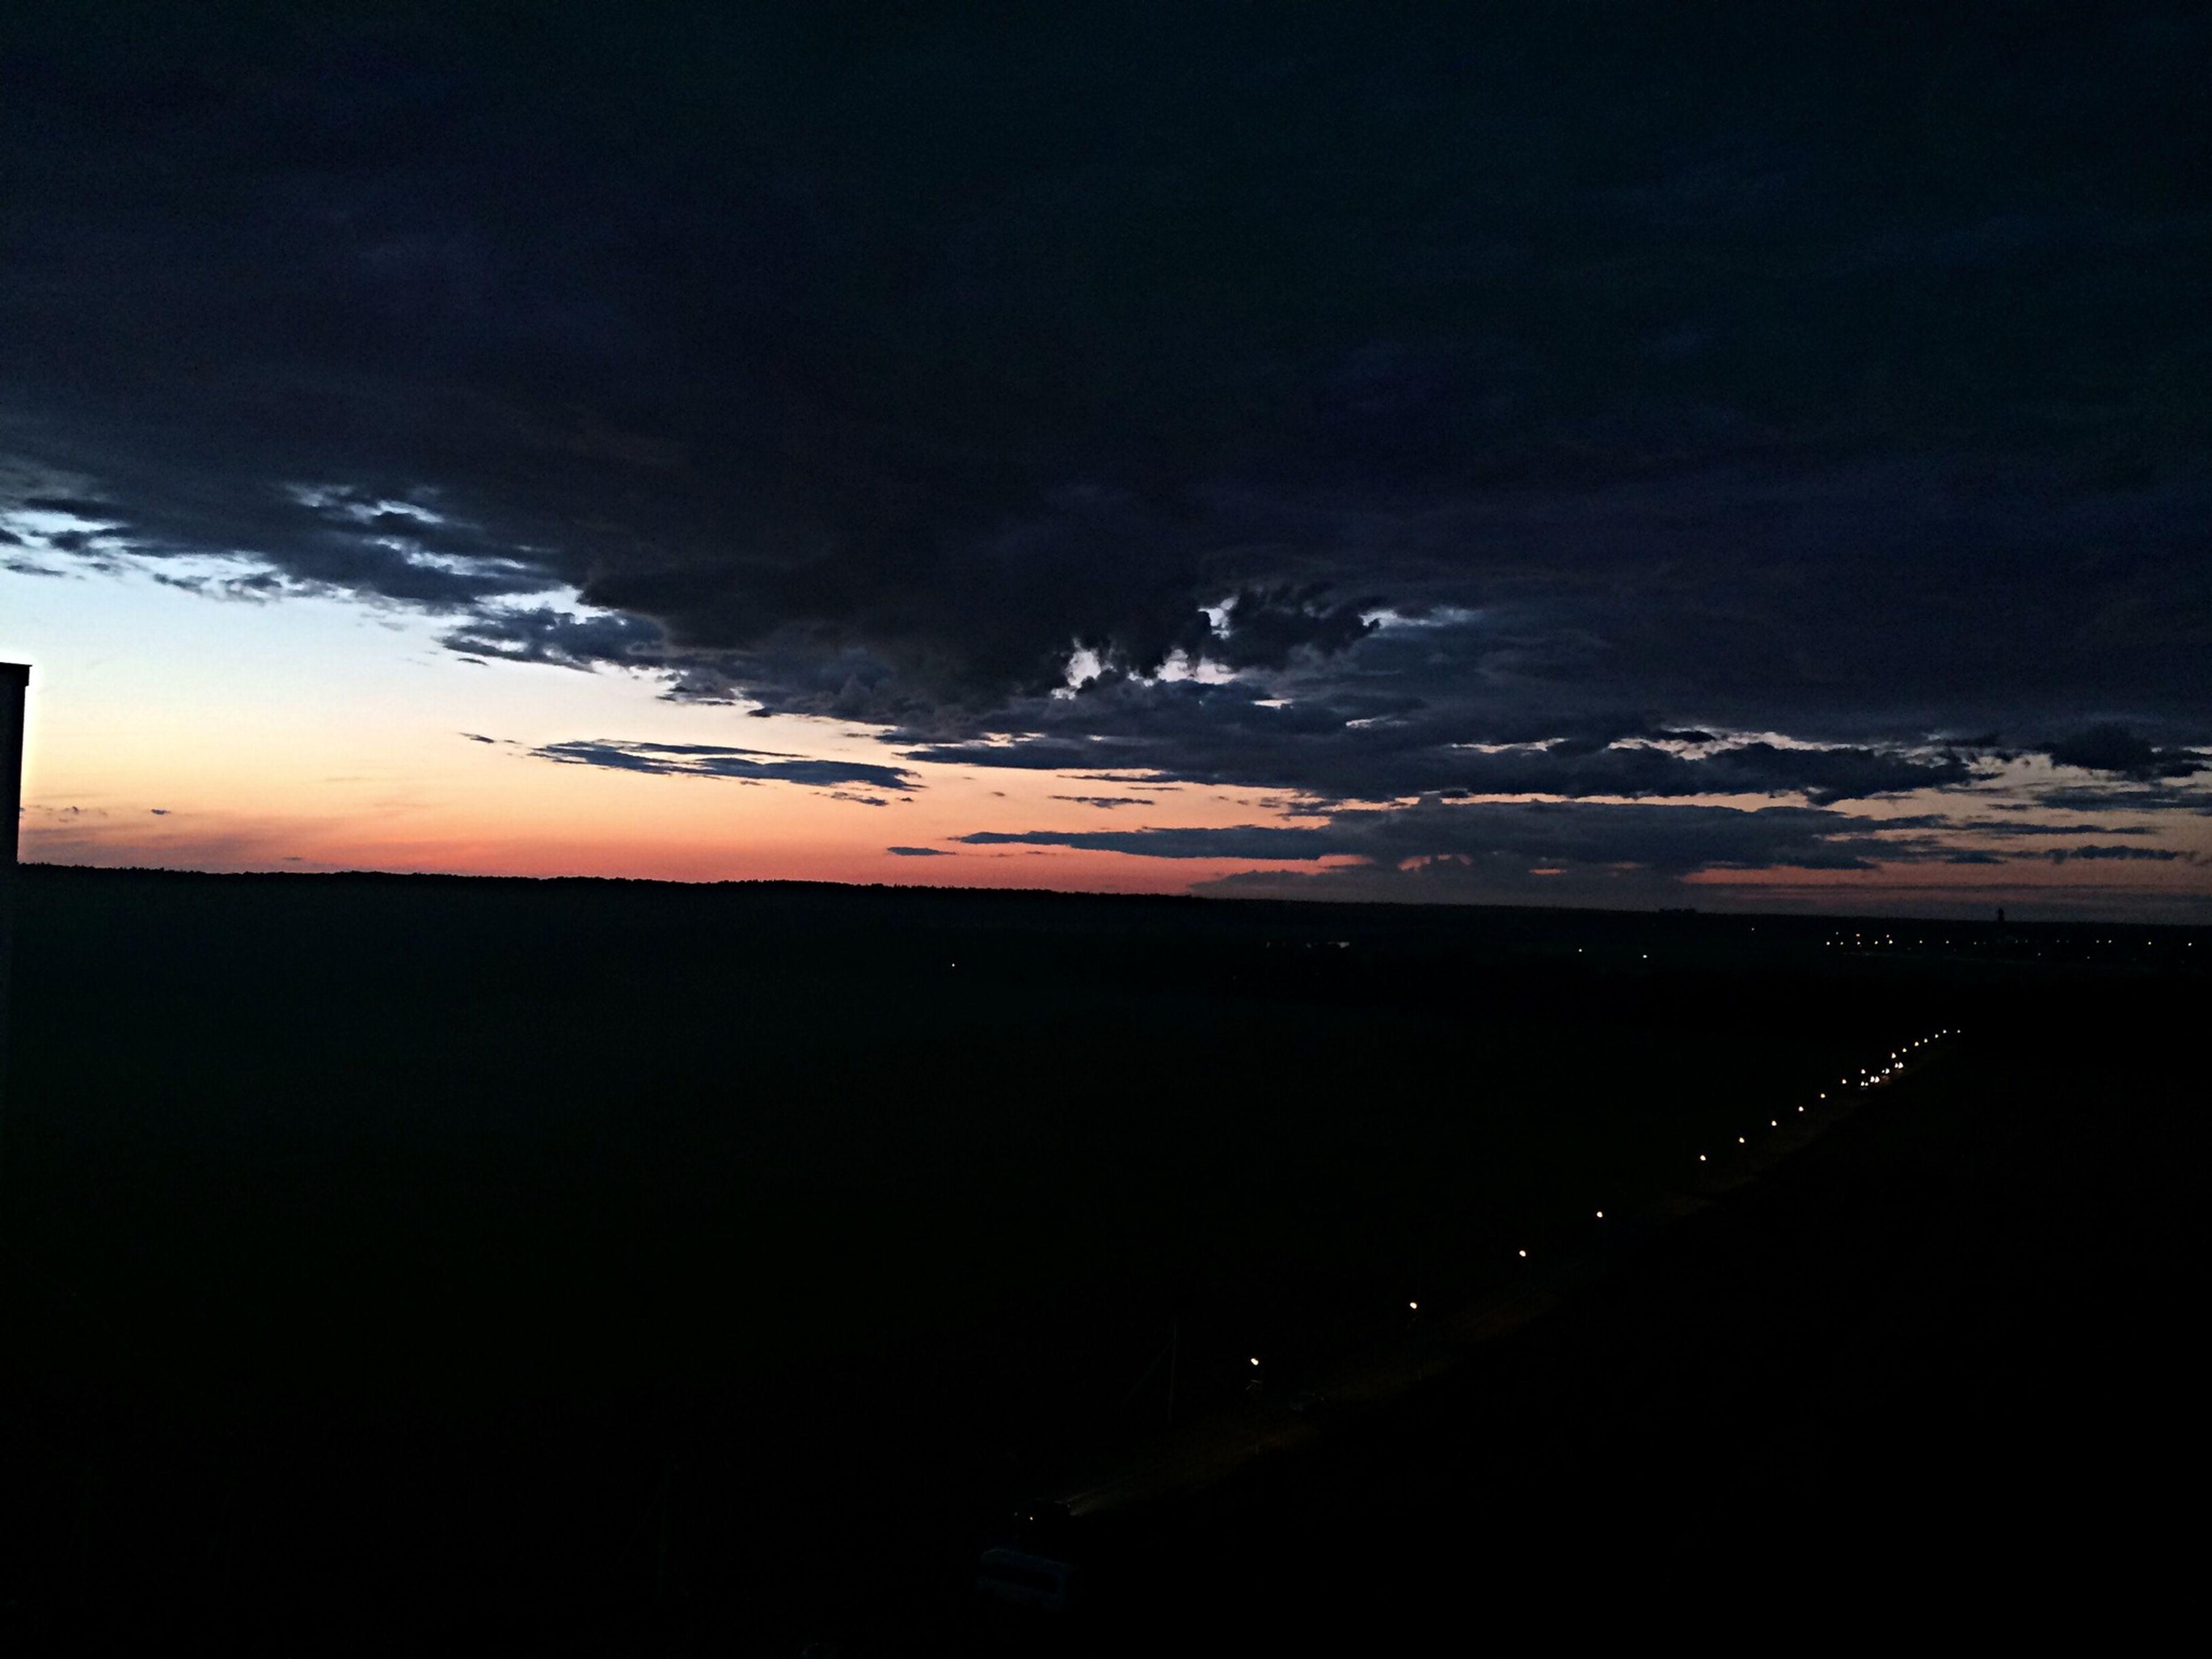 sky, scenics, sunset, tranquil scene, beauty in nature, silhouette, tranquility, sea, cloud - sky, beach, dusk, nature, idyllic, dark, horizon over water, water, cloudy, dramatic sky, night, shore